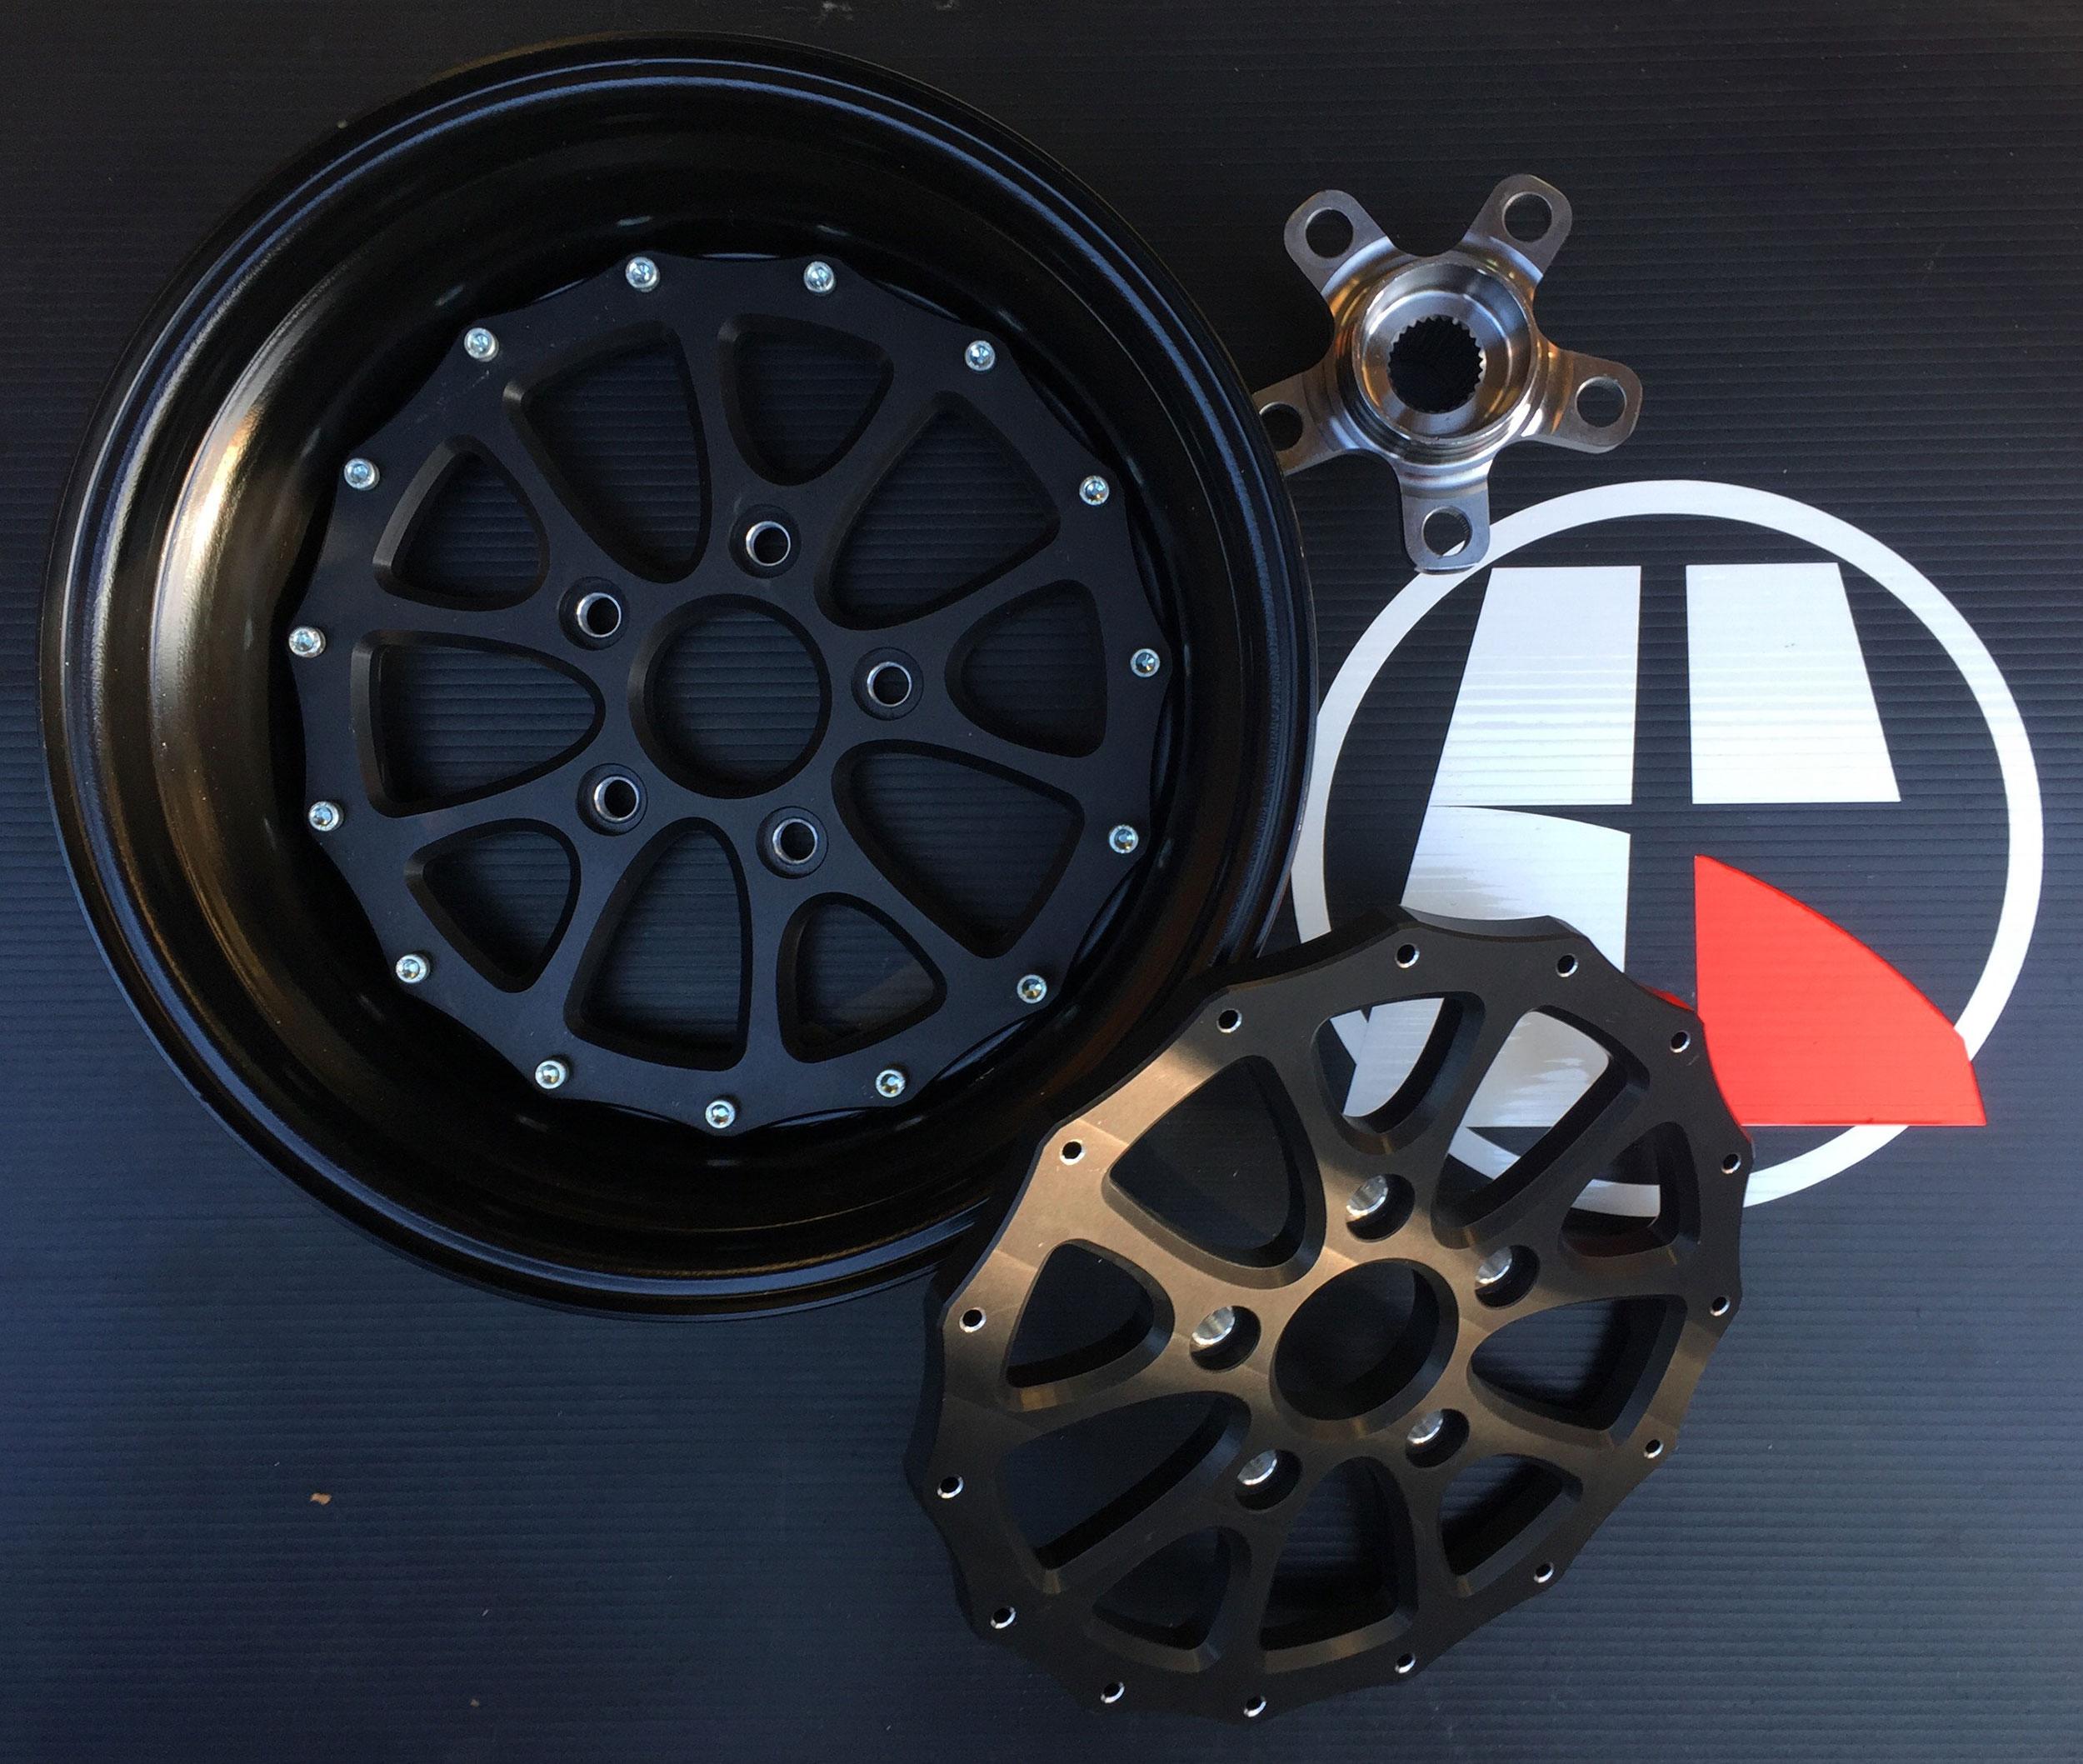 Wheel-and-hub